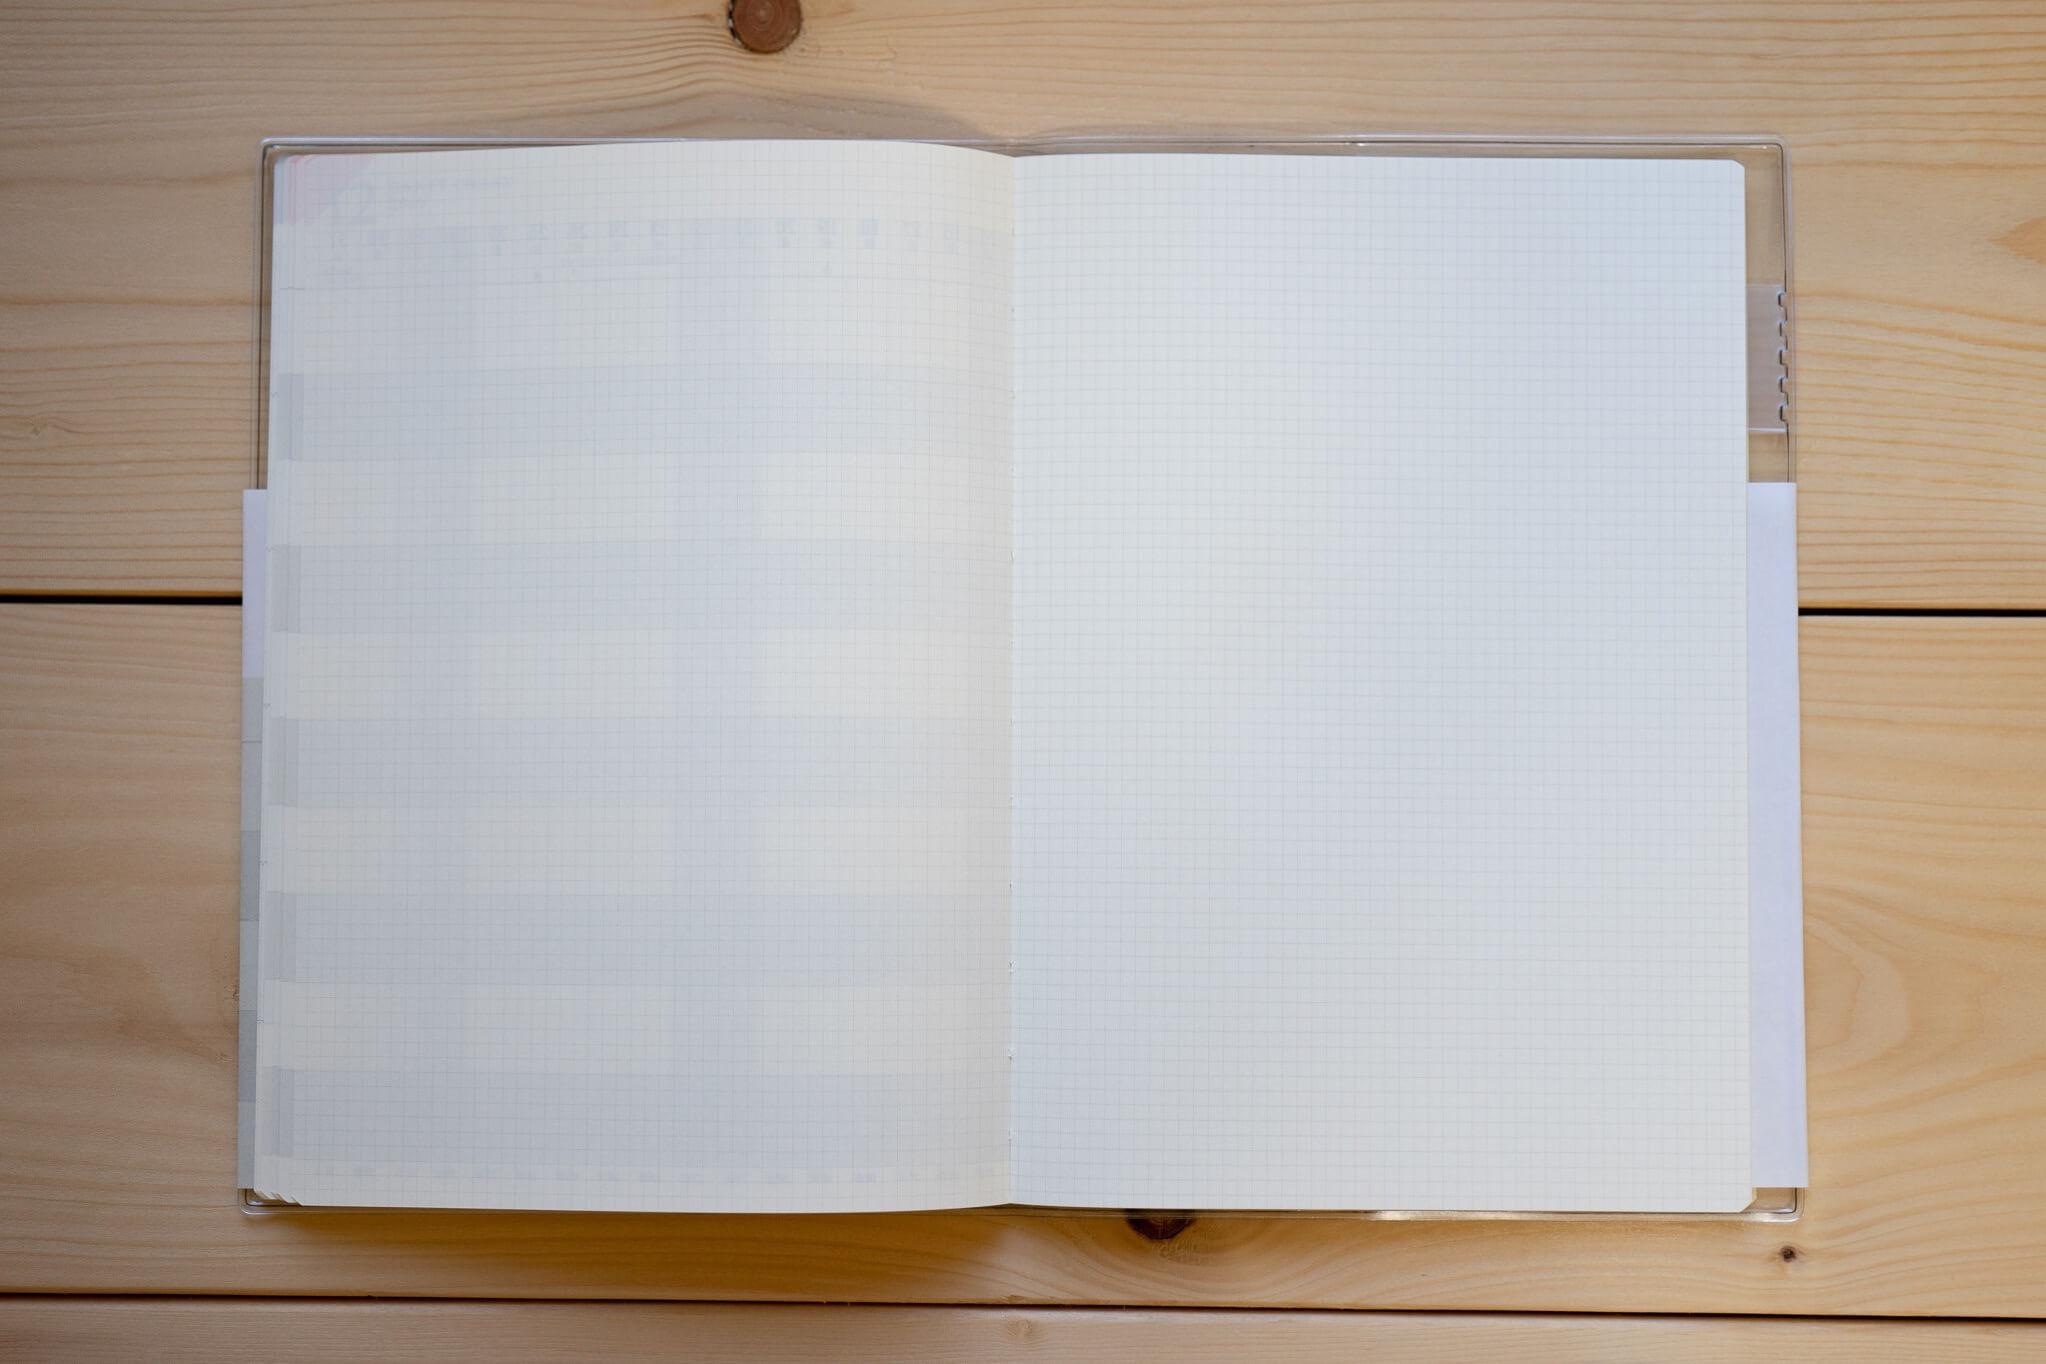 180828 gantt chart diary 10